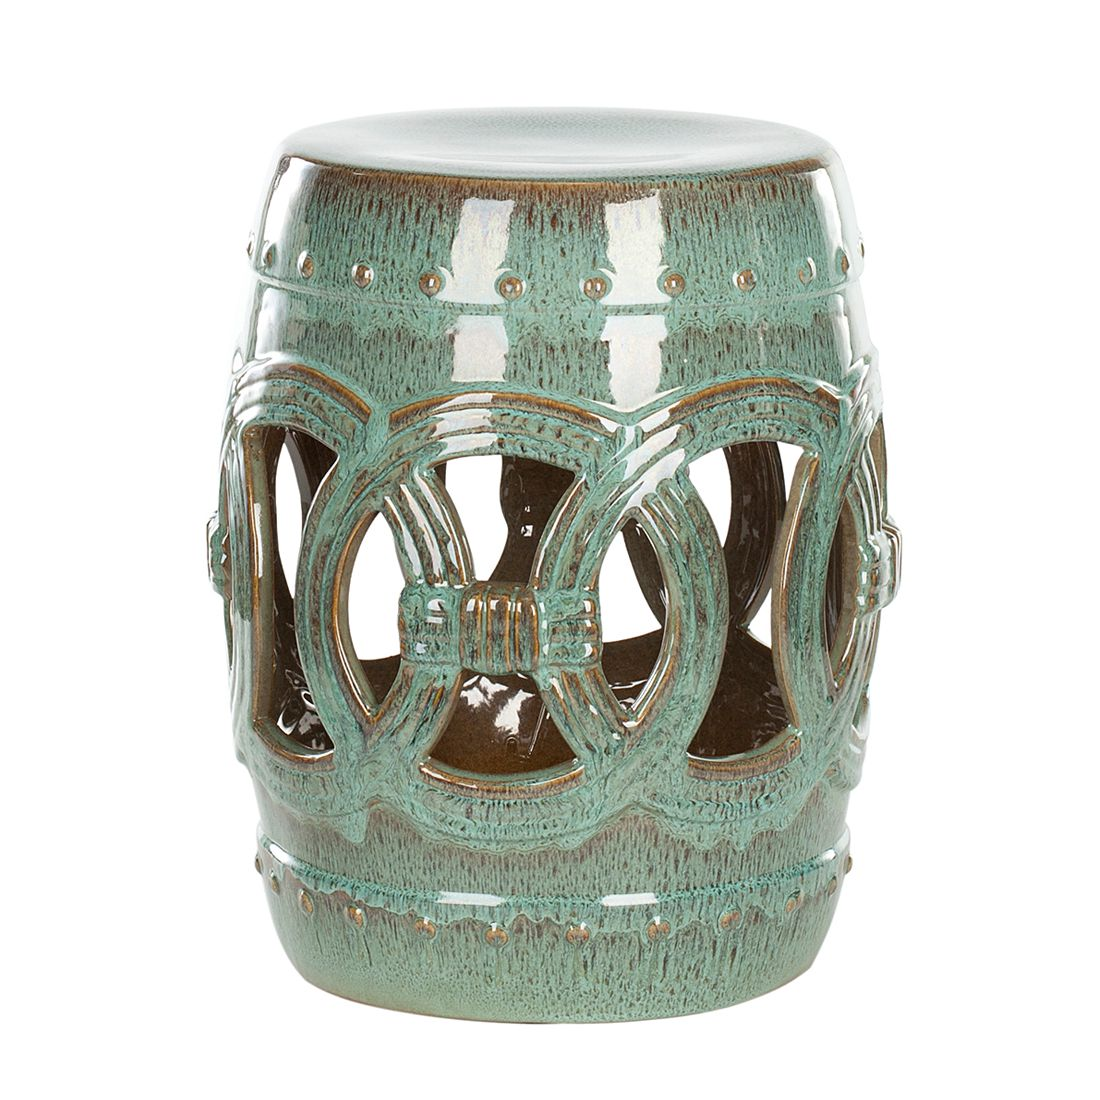 Keramikhocker Double Coin – Türkis, Safavieh bestellen